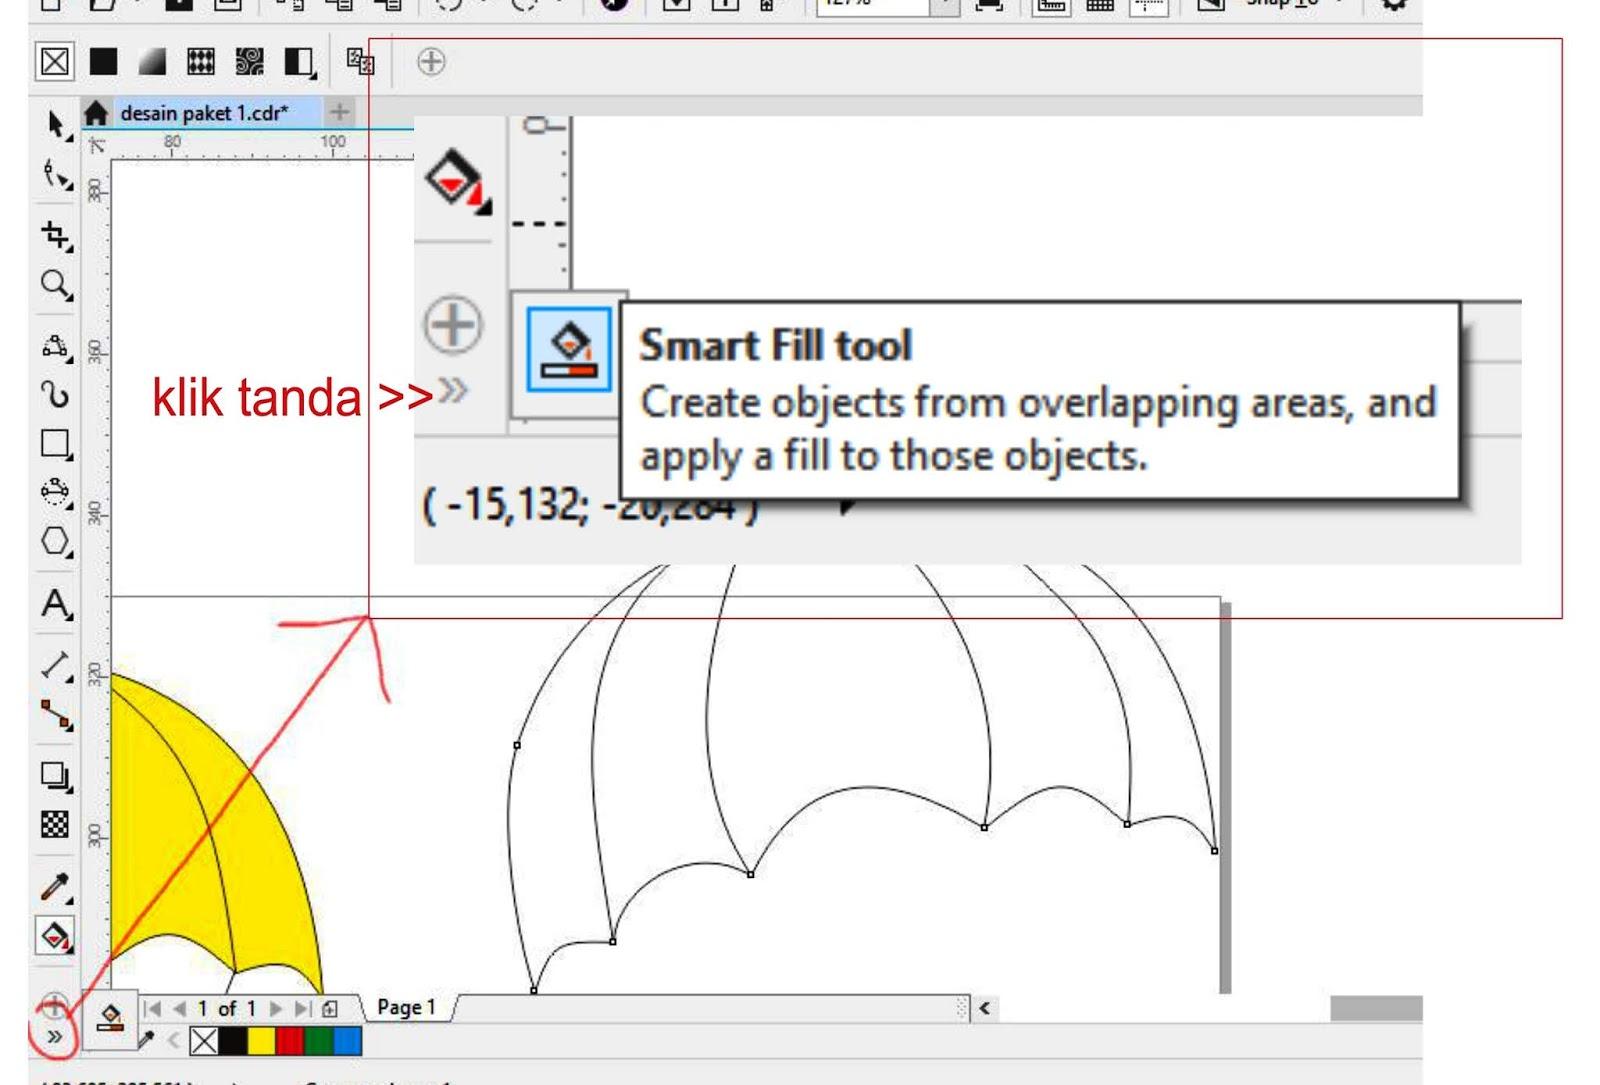 Memanfaatkan Fungsi Smart Fill Tool Di Coreldraw X8 Untuk